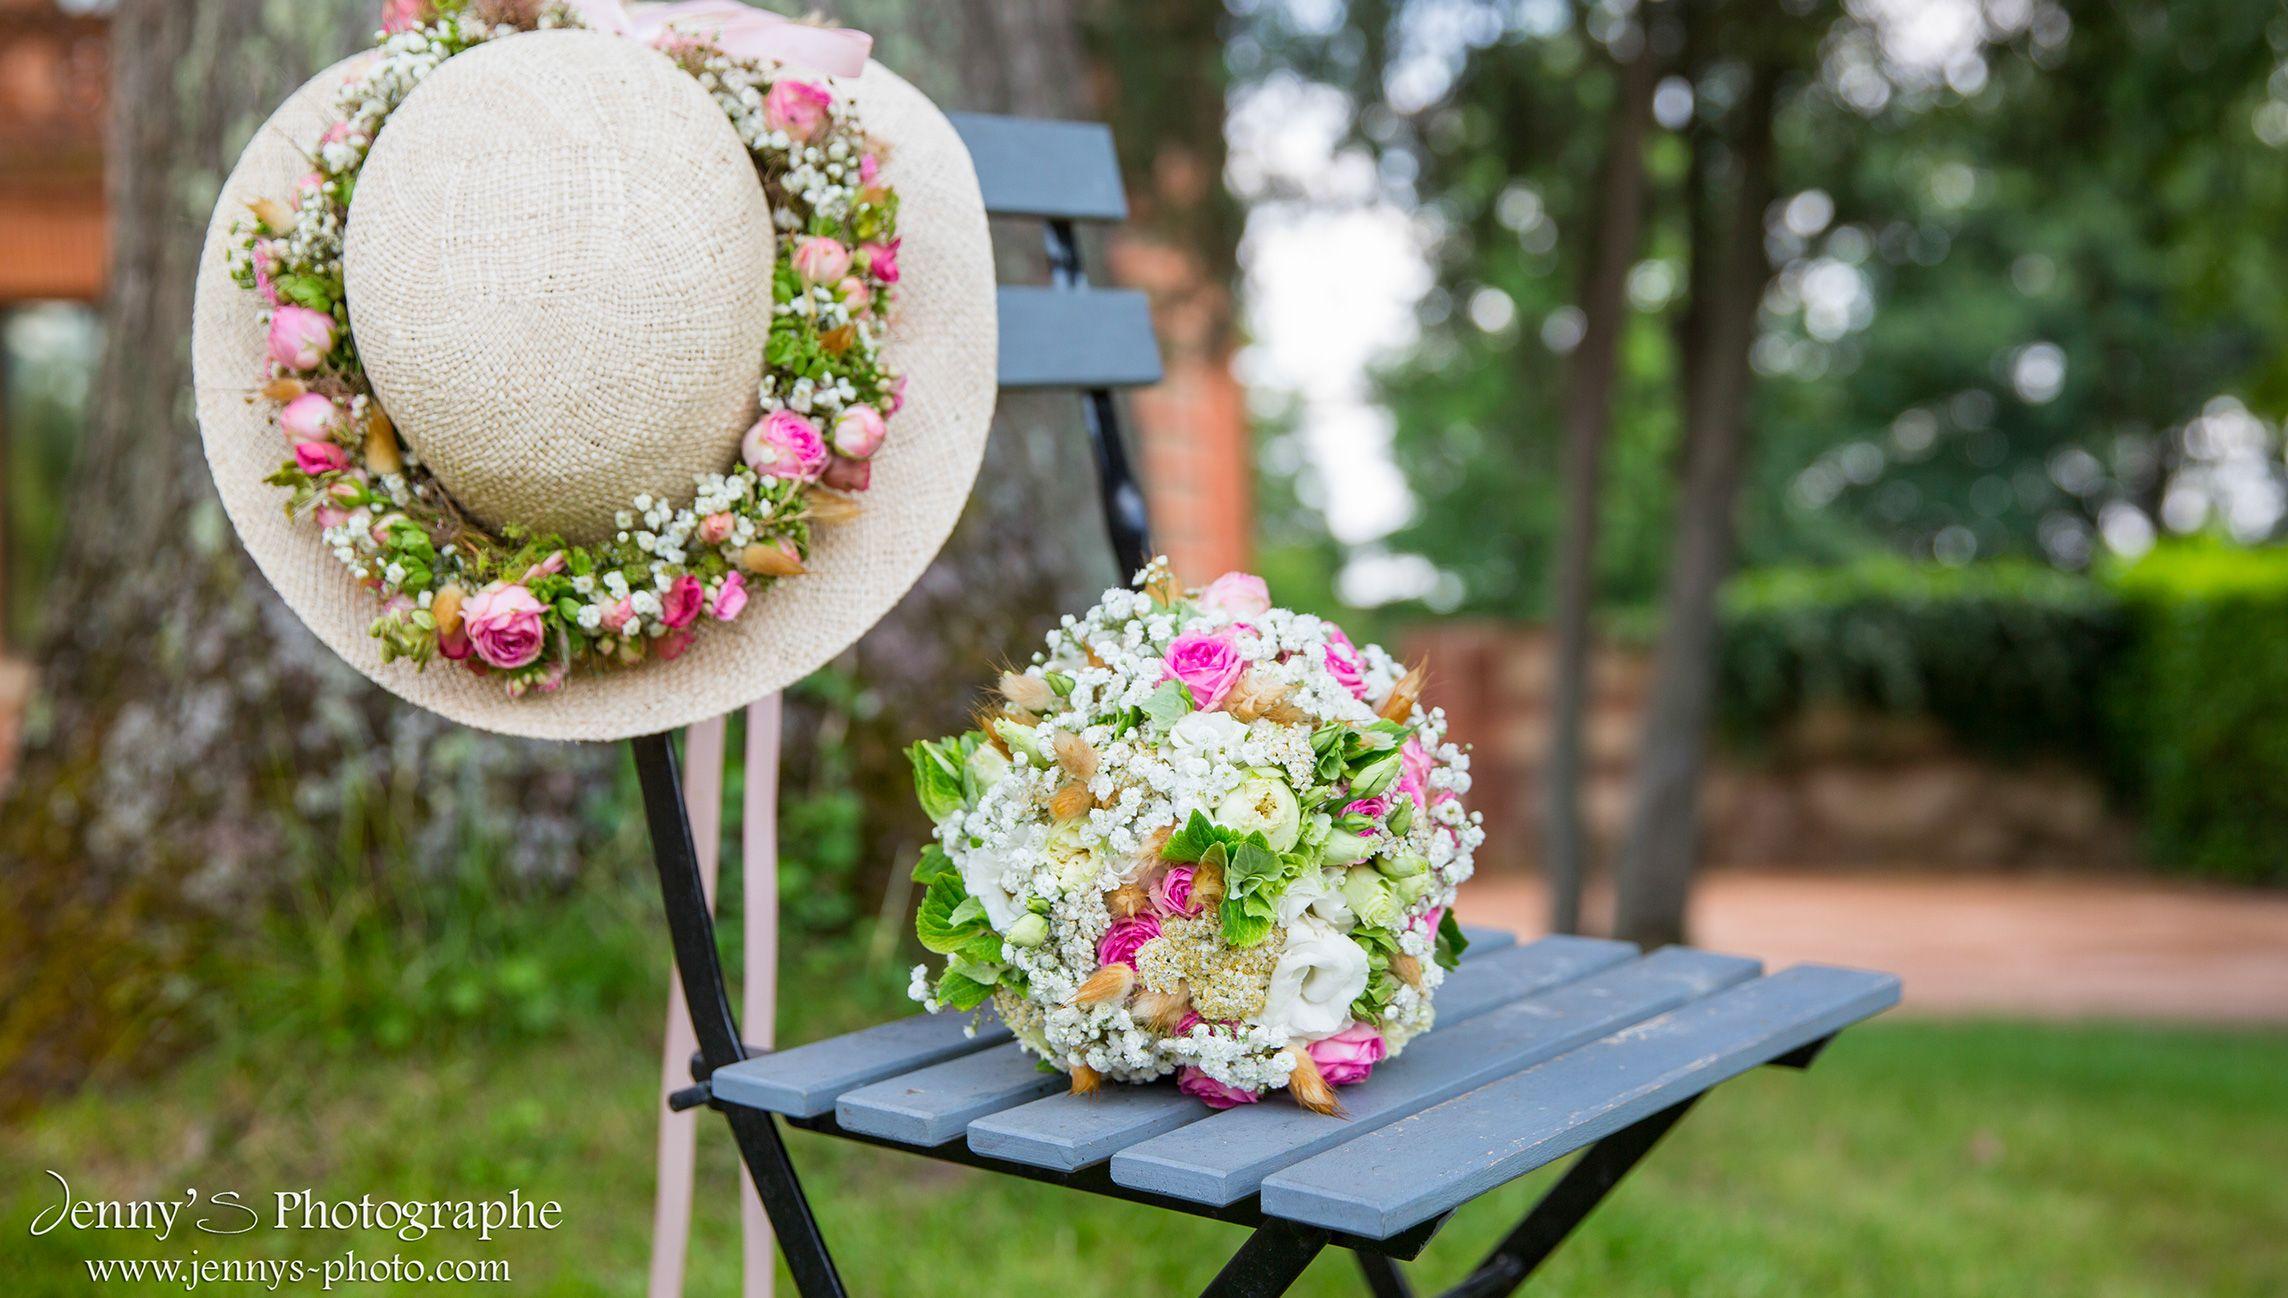 Mariage - formation fleuriste